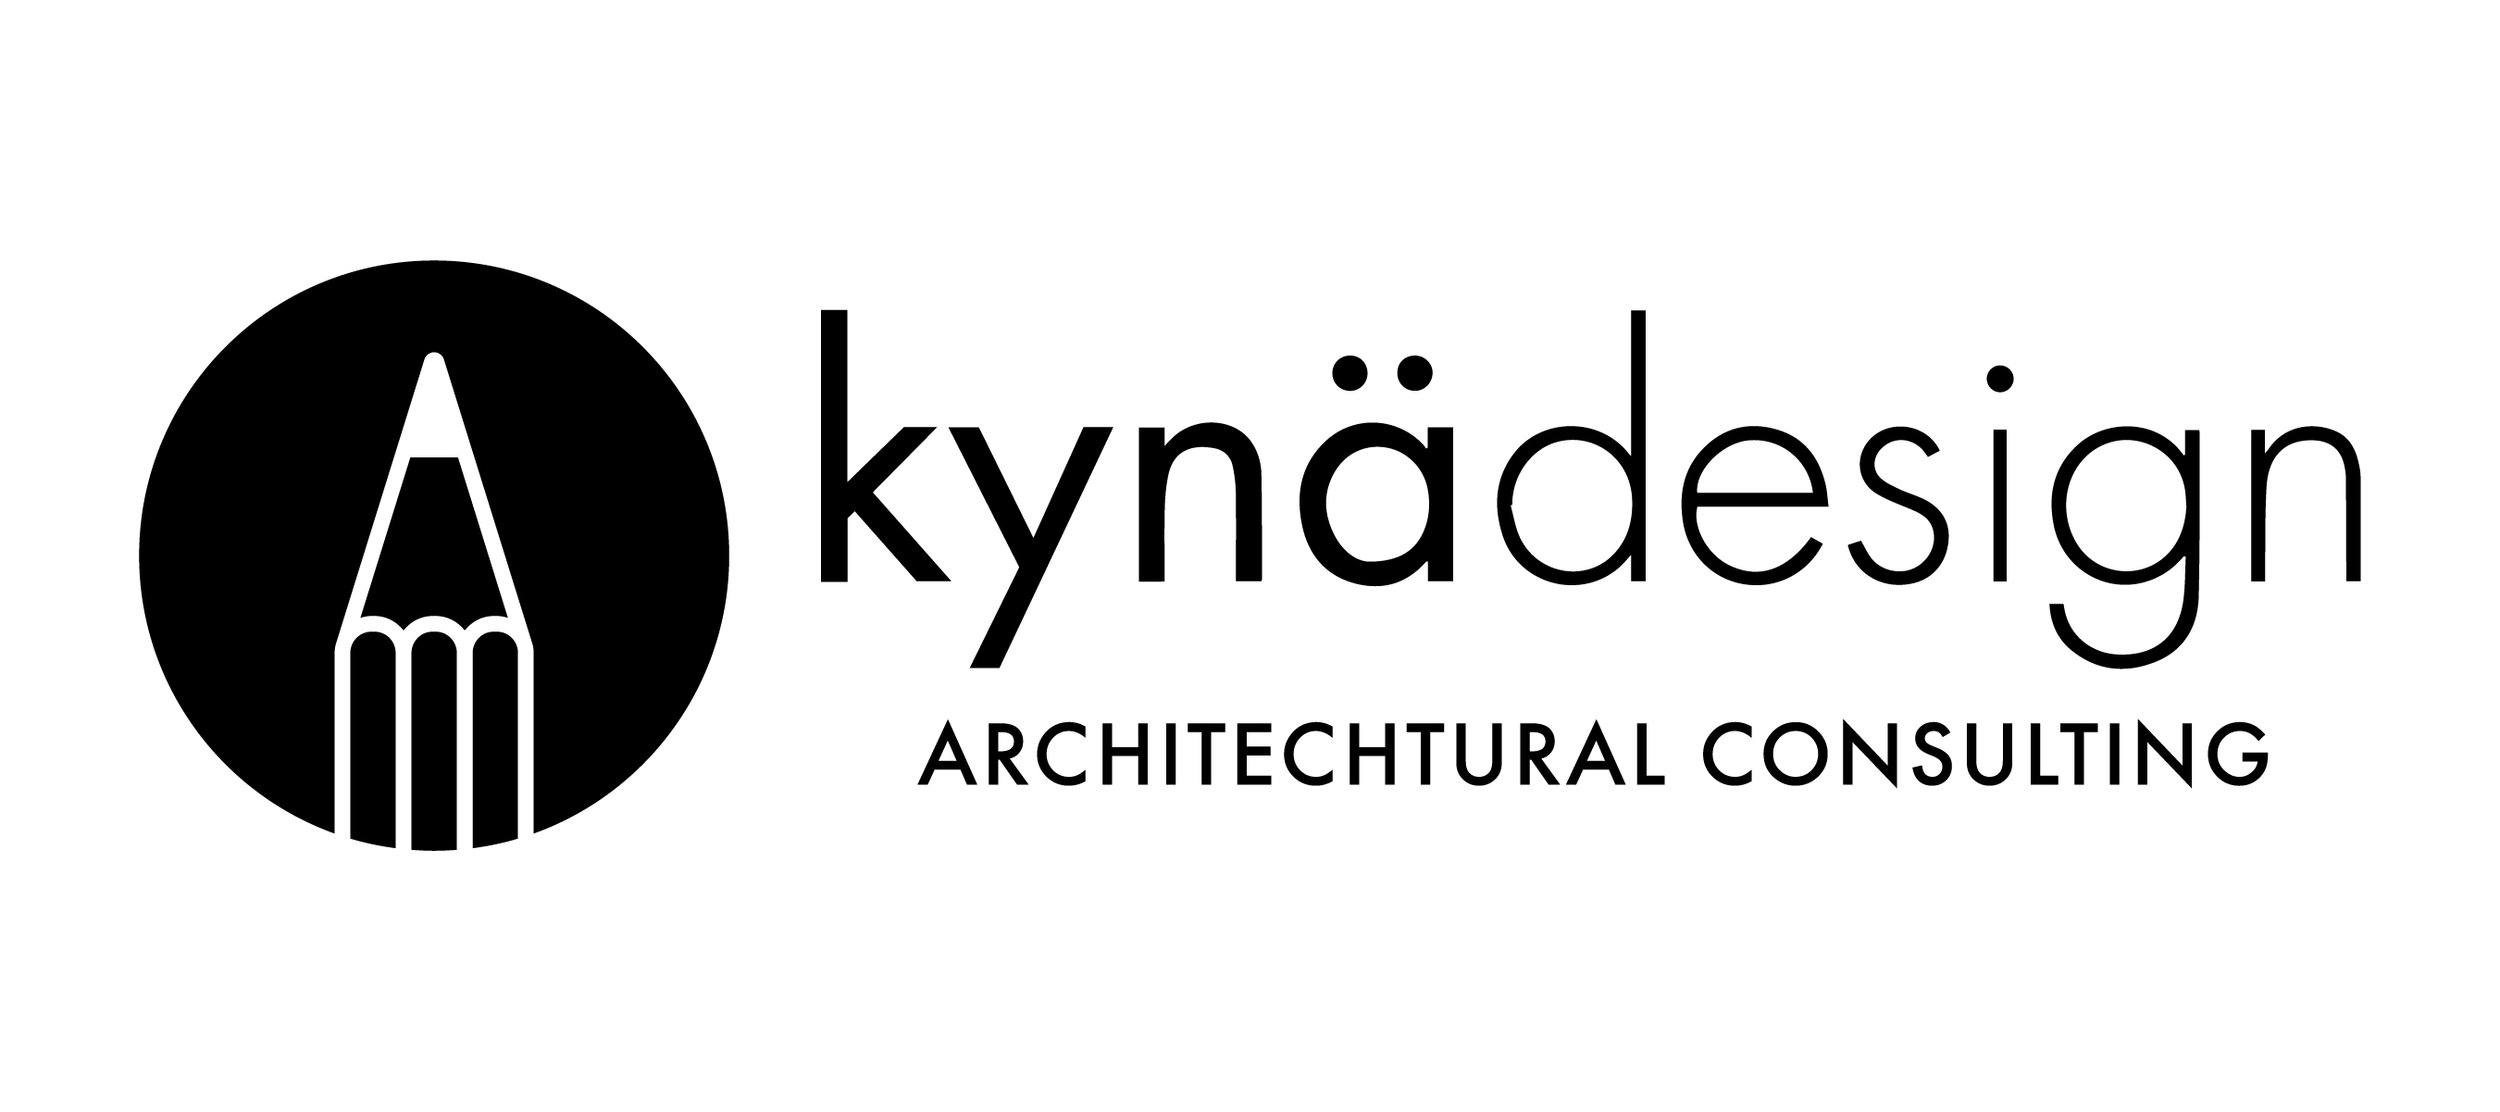 kynadesign_logo_horizontal_title.jpg